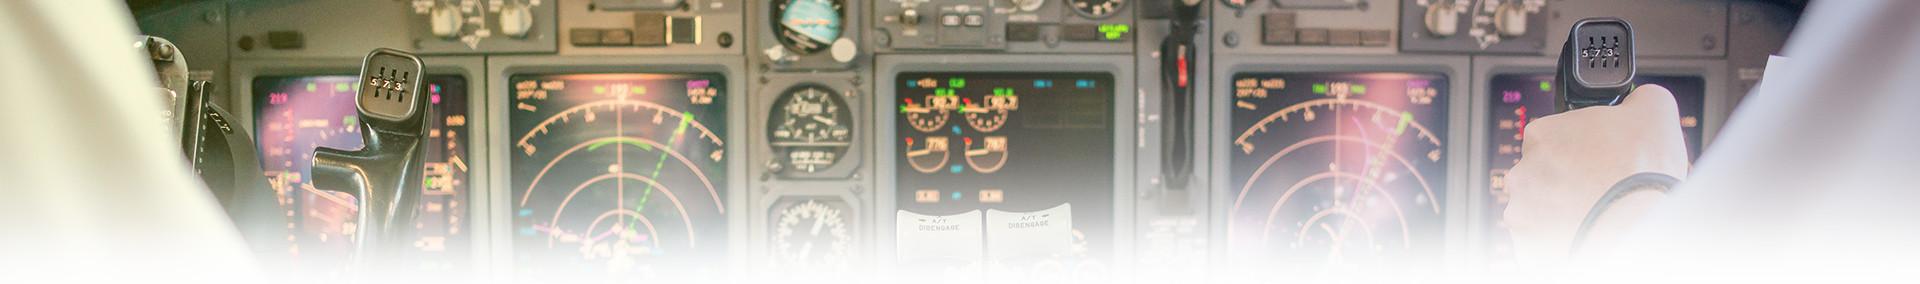 eMobility   eMRO Airline Fleet Management Software